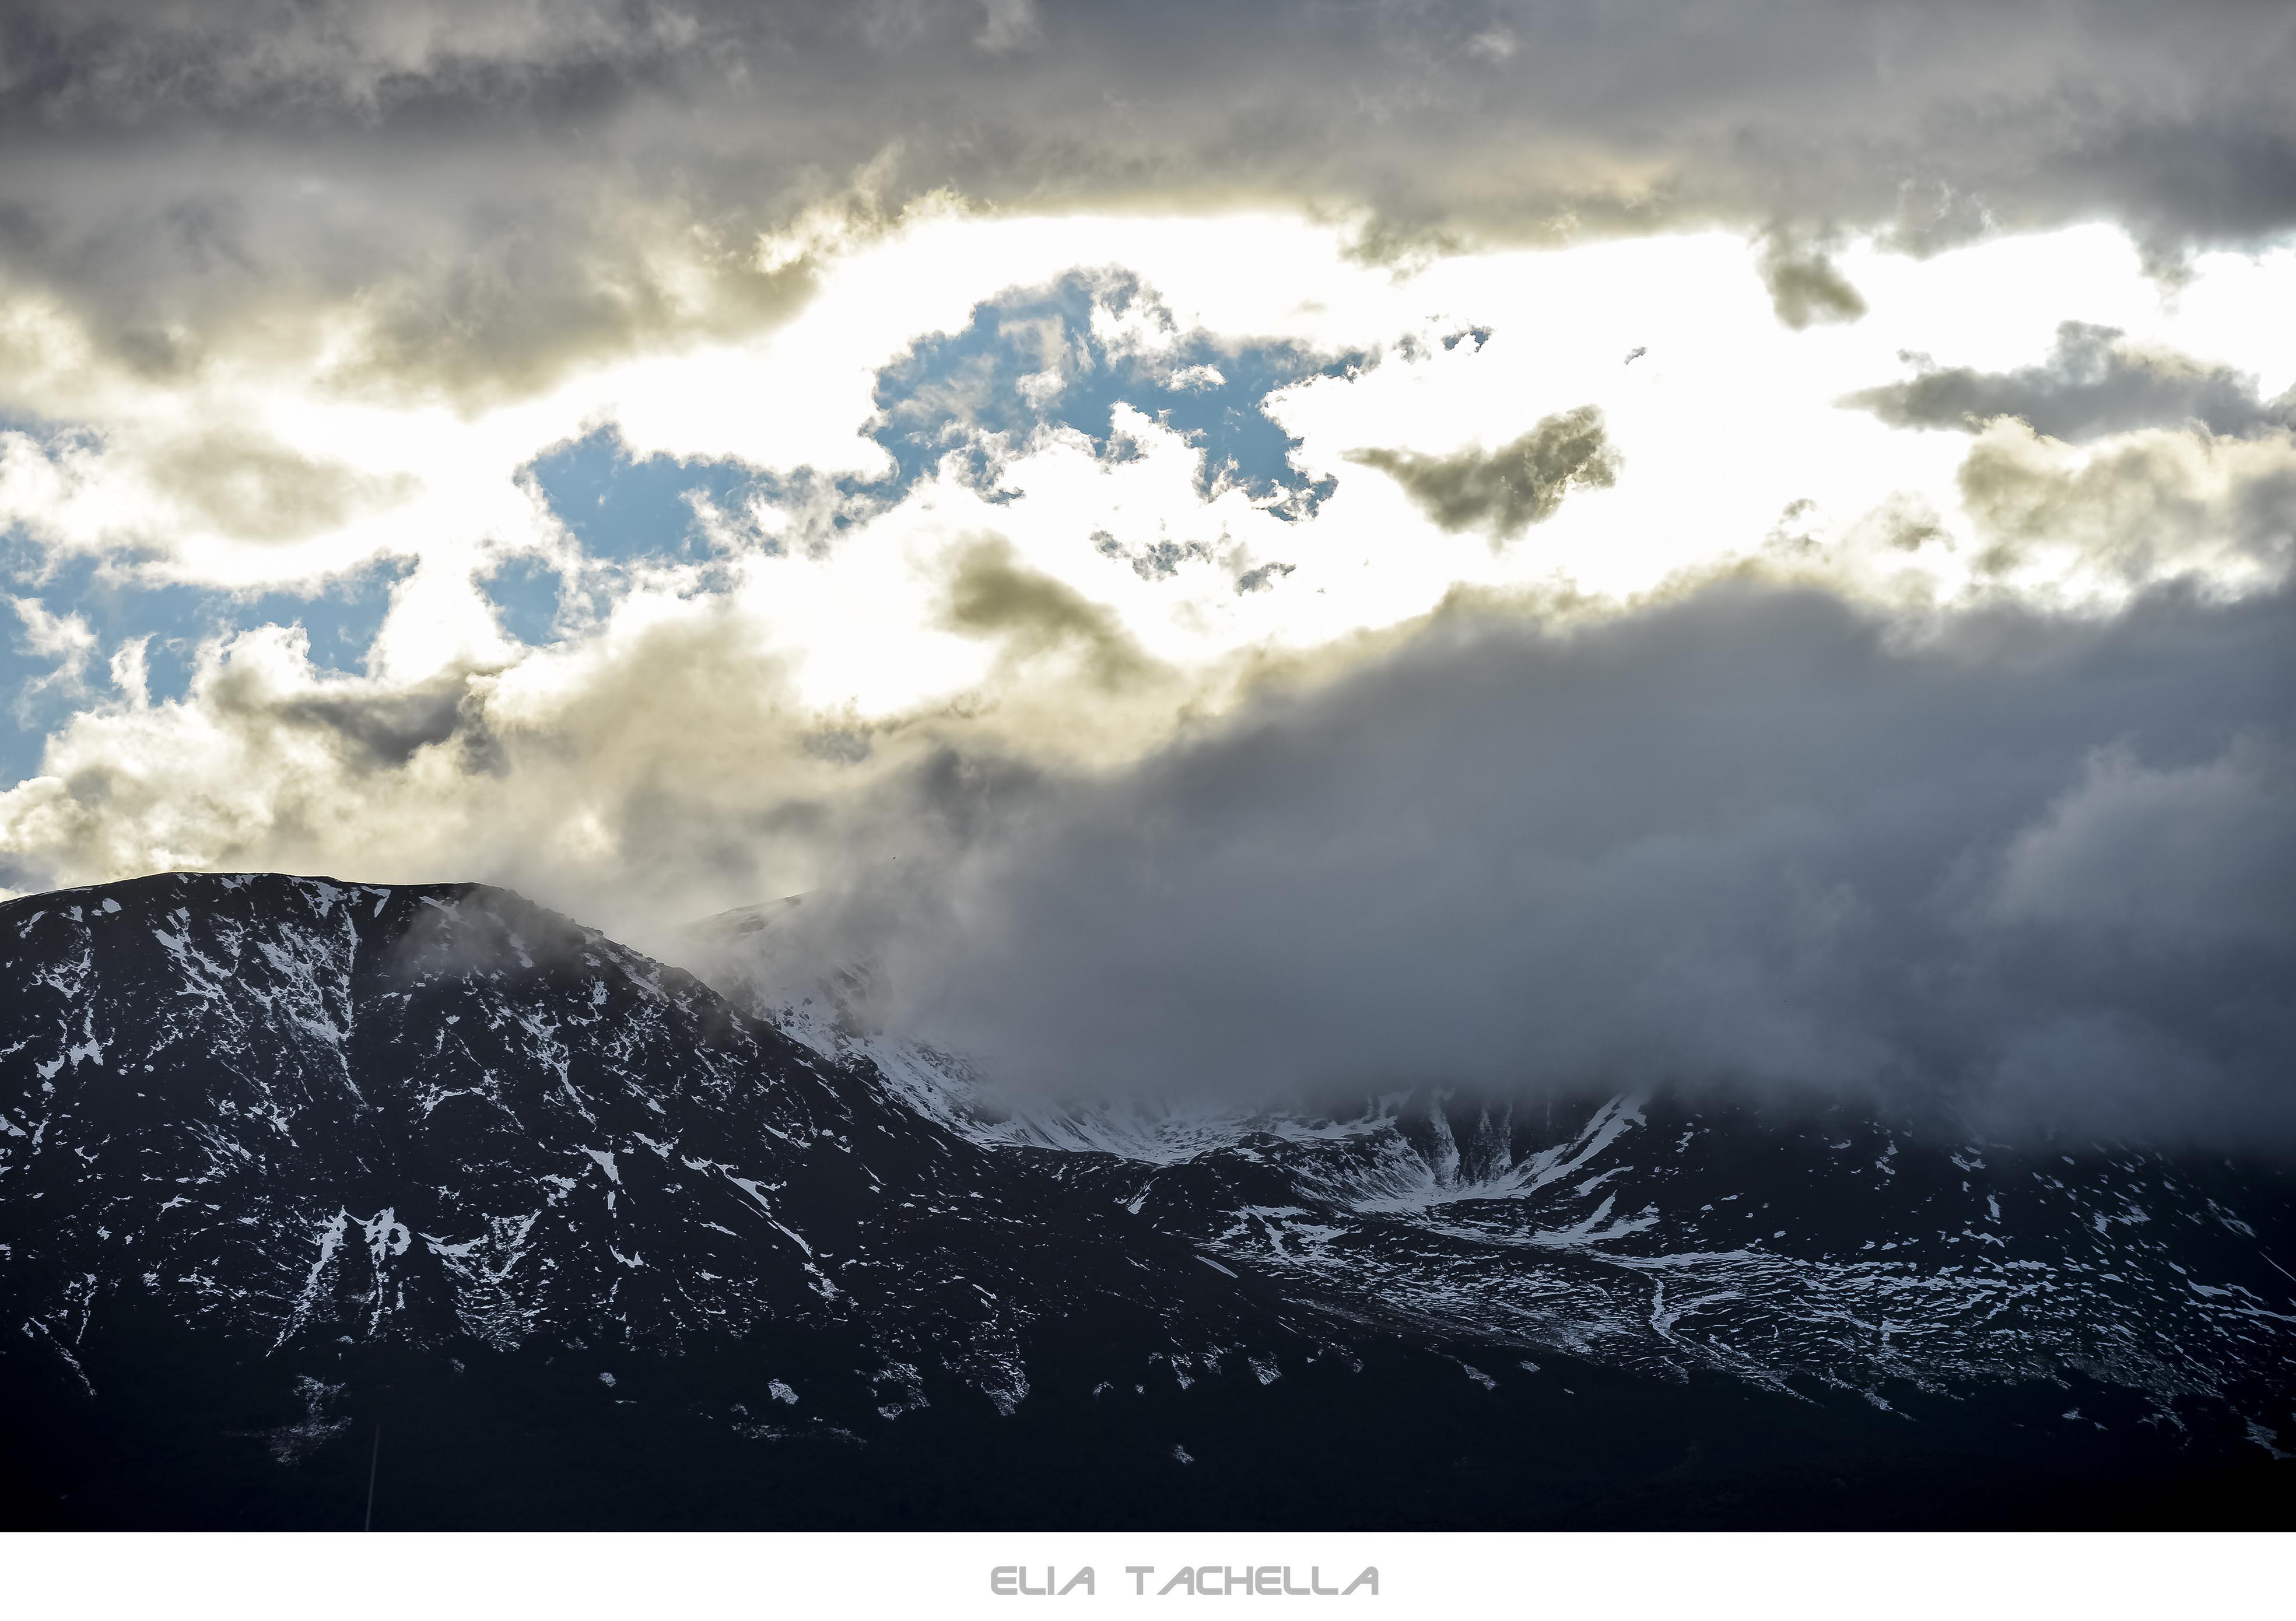 UnaSiesta-EliaTachella-2014.jpg